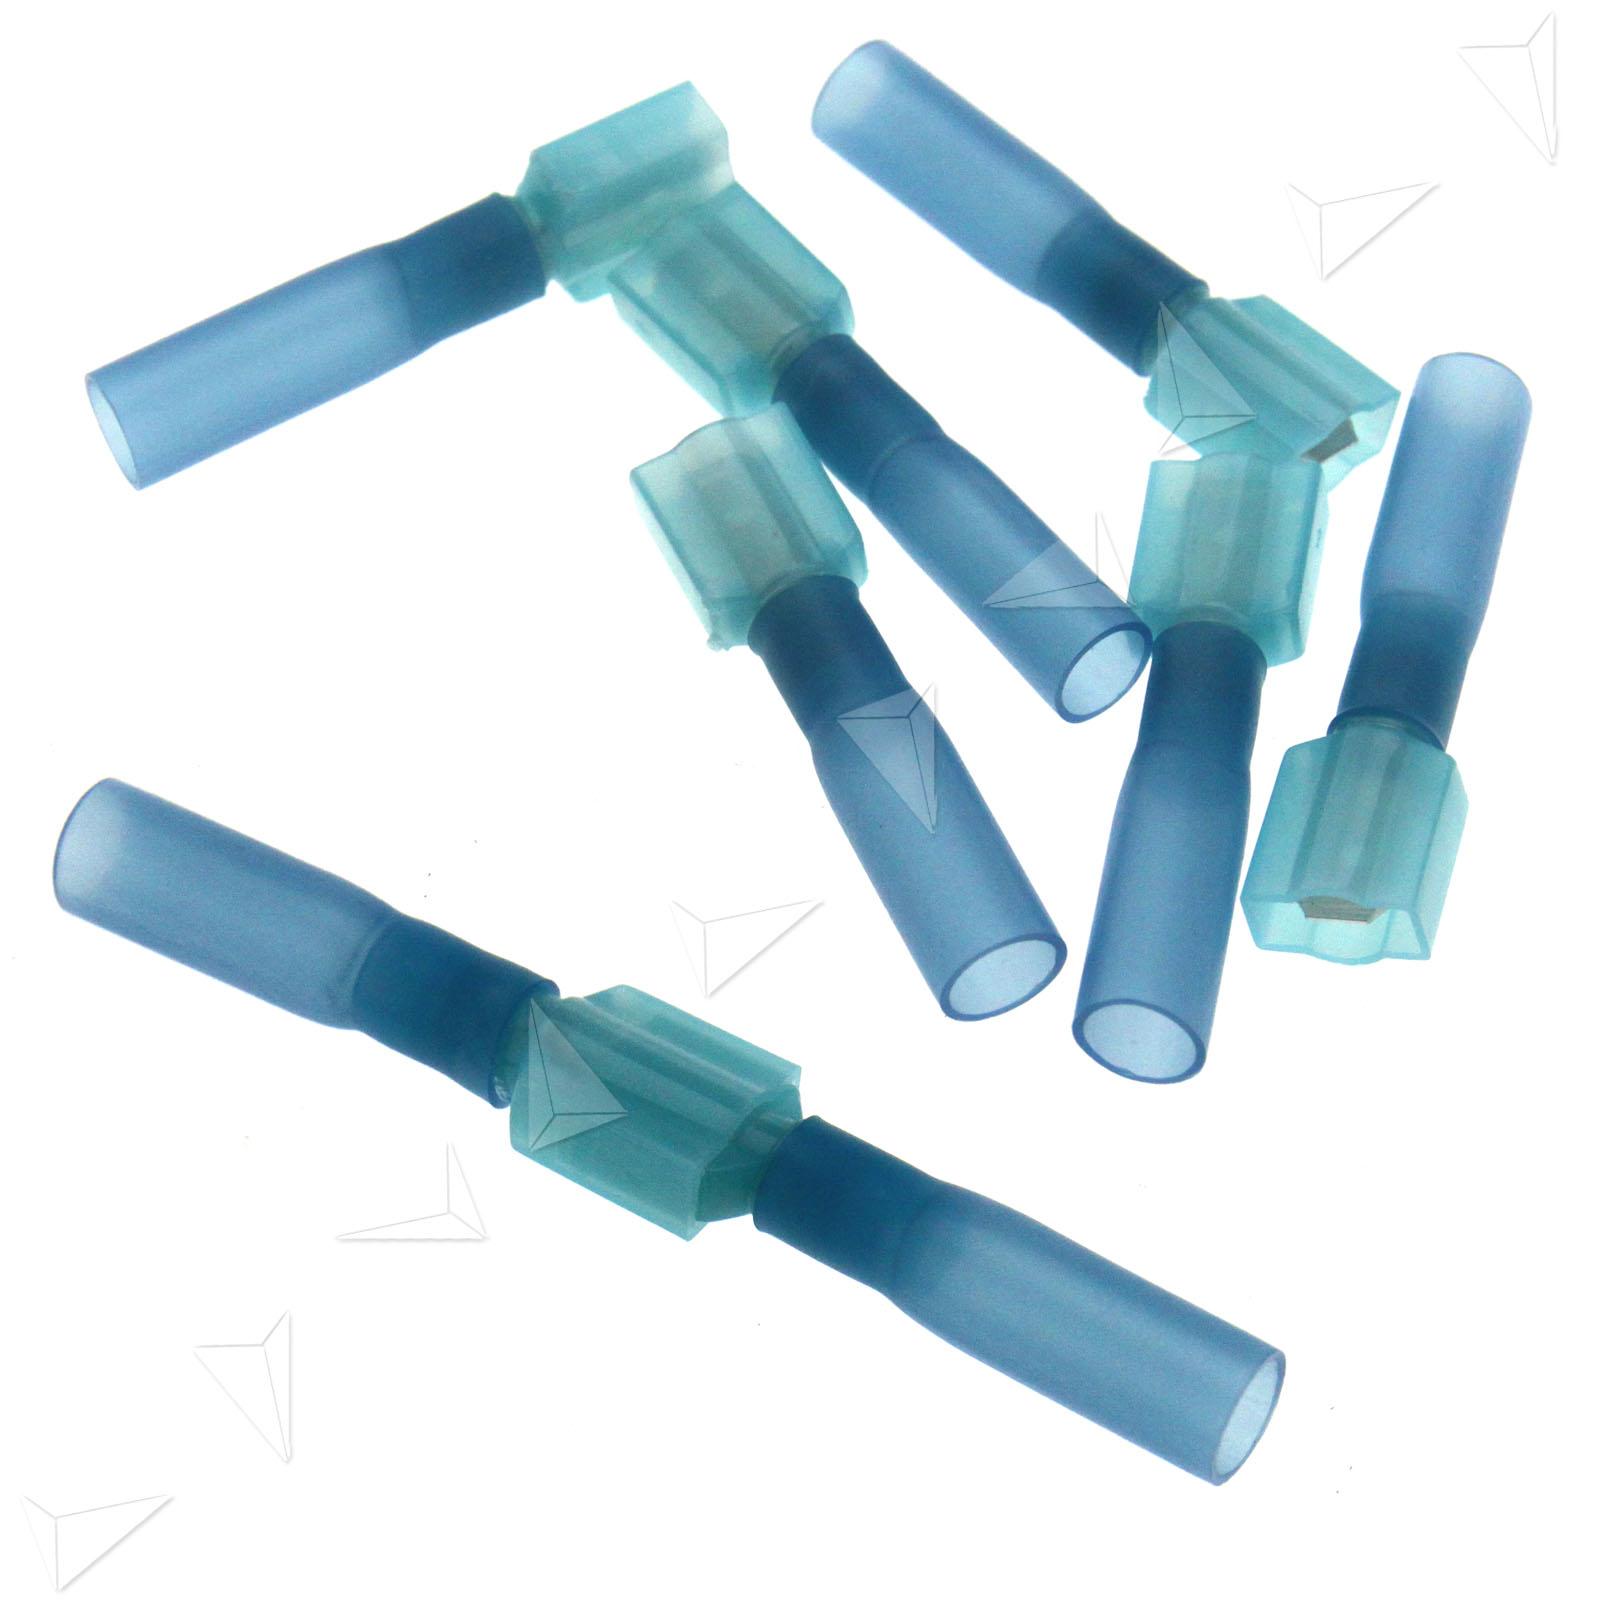 50pcs blue male female spade heatshrink terminal connector crimp ebay. Black Bedroom Furniture Sets. Home Design Ideas